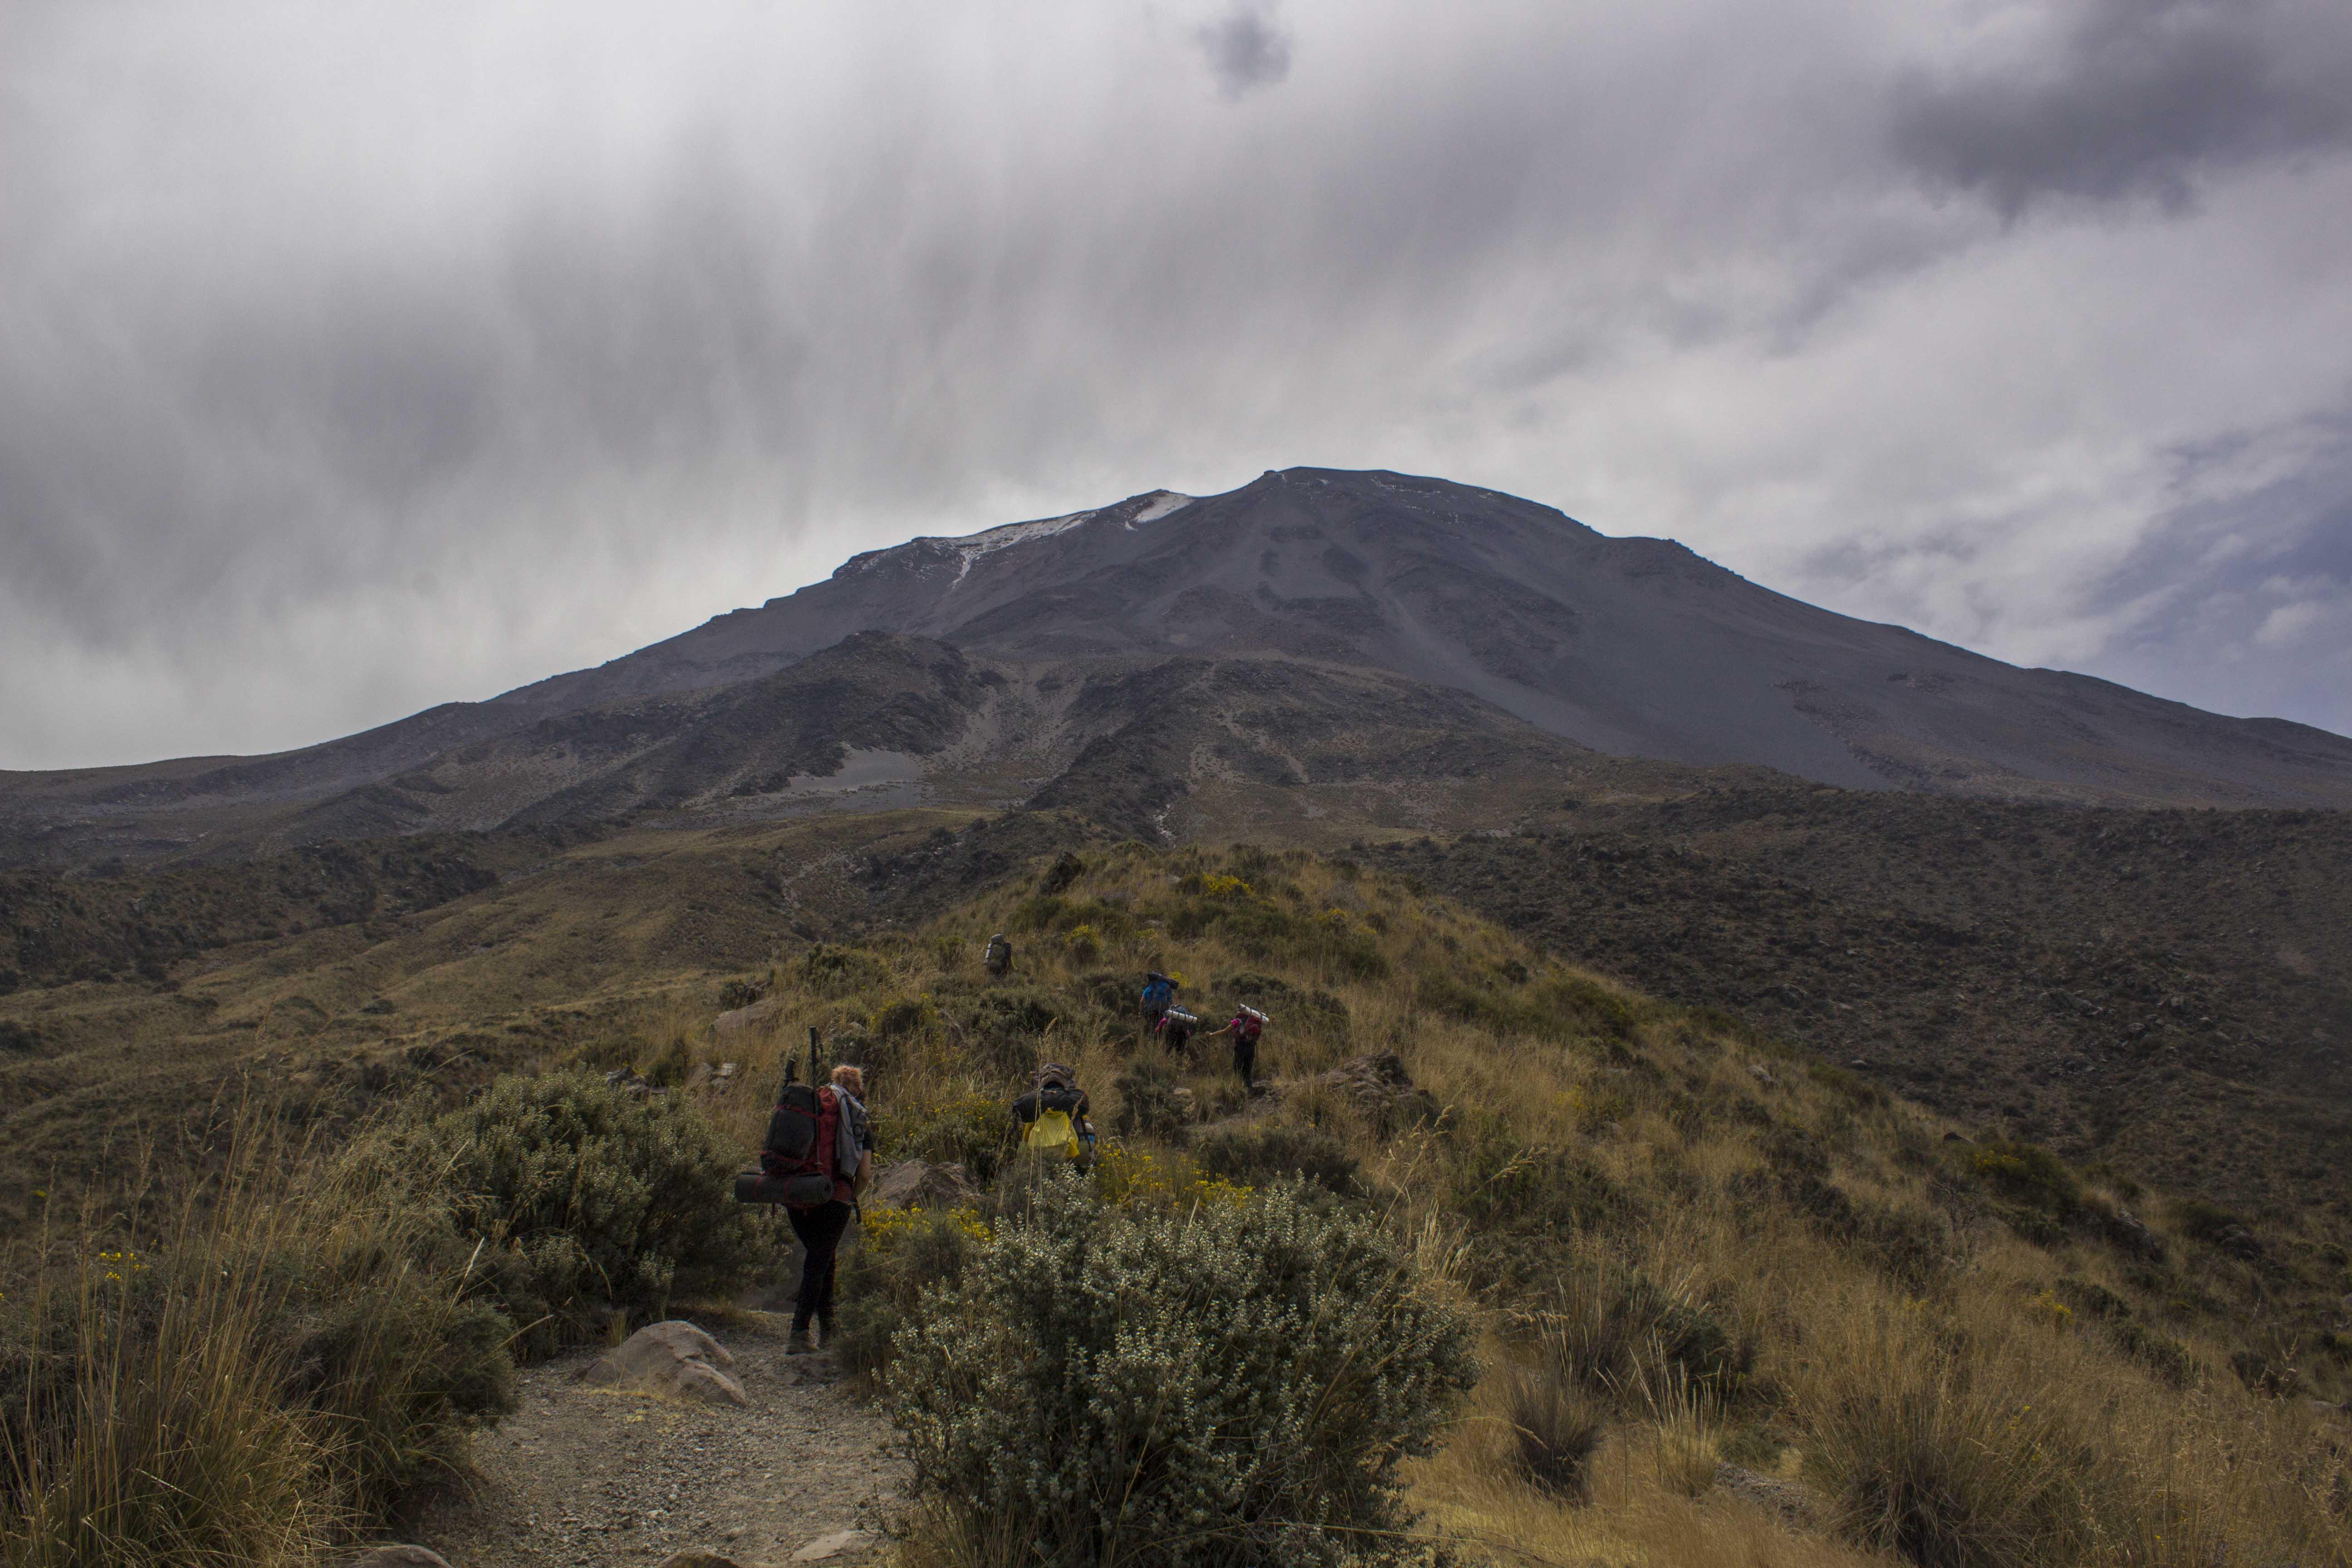 Misti Volcano in Arequipa, Peru